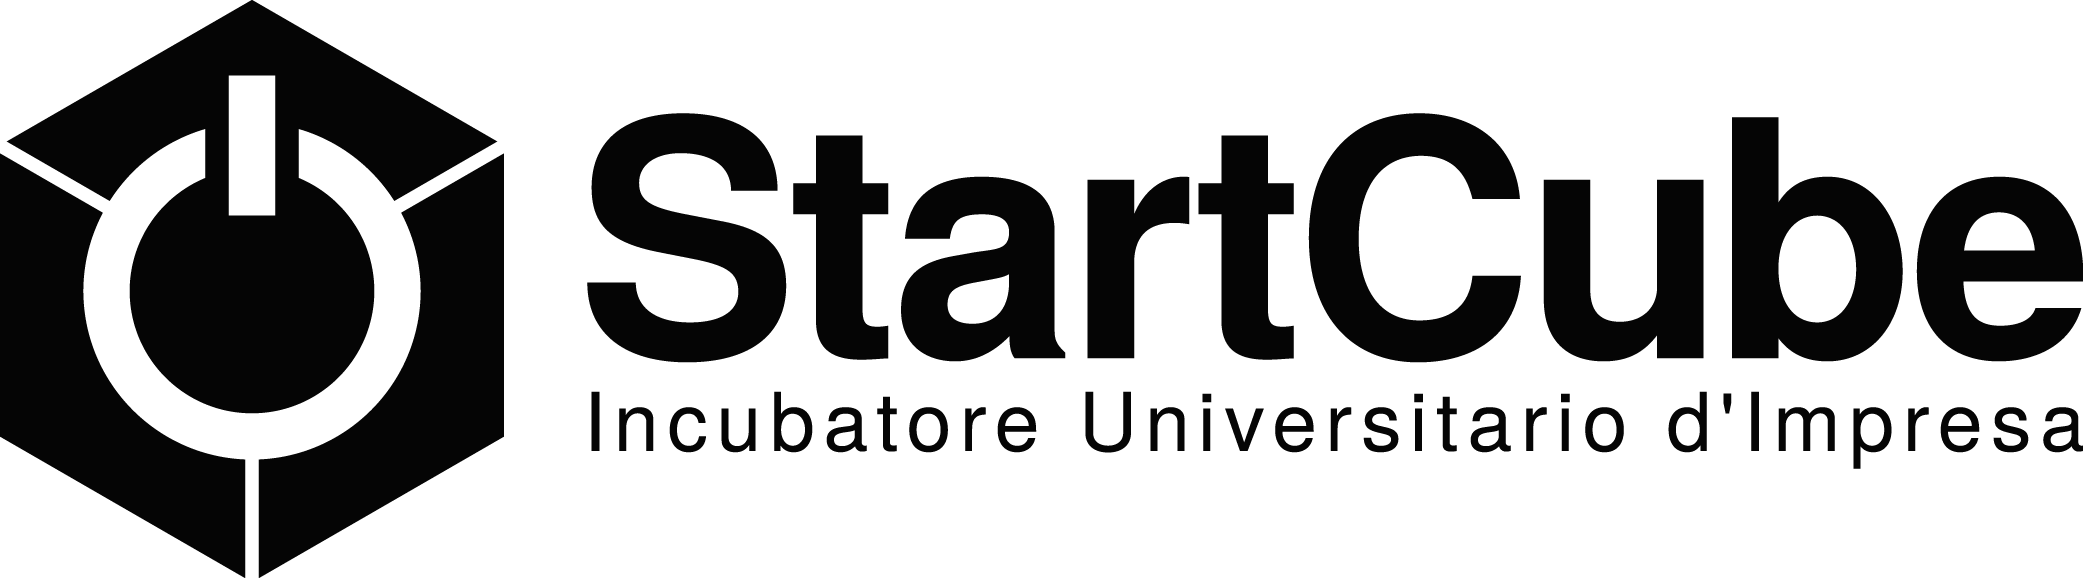 logo_startcube_fondo_bianco-1